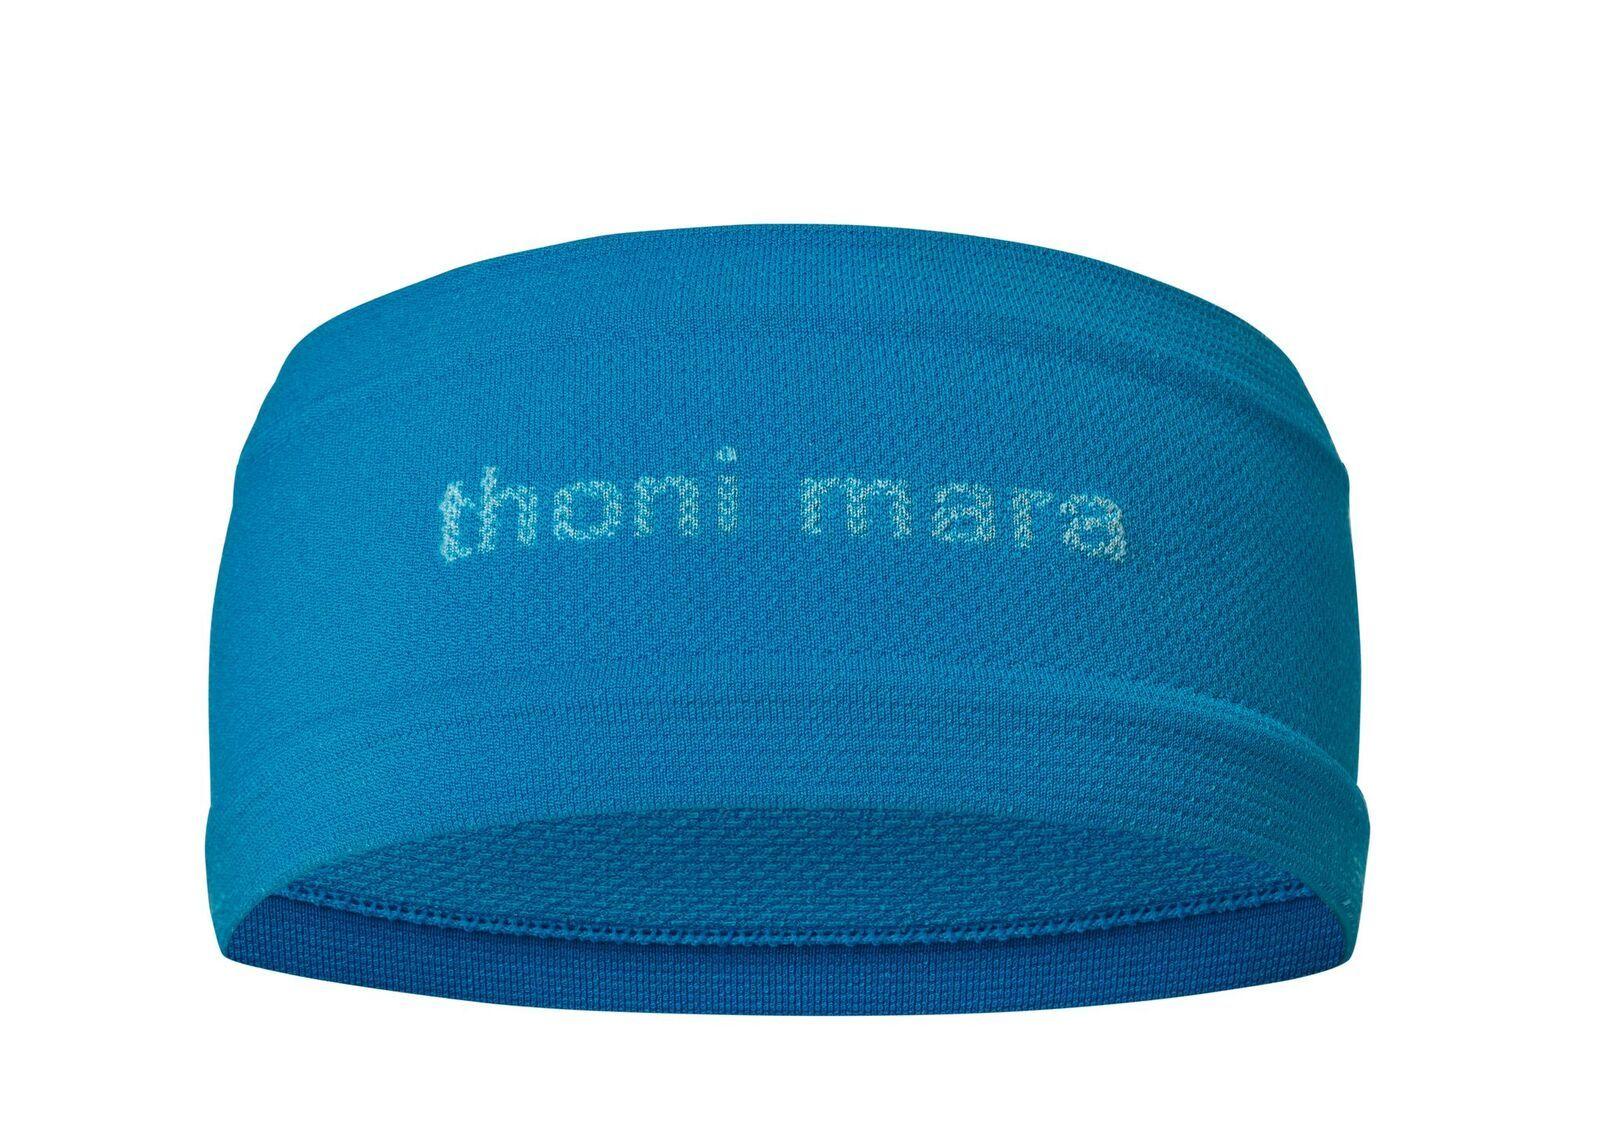 Thonimara Stirnband mini in Türkis